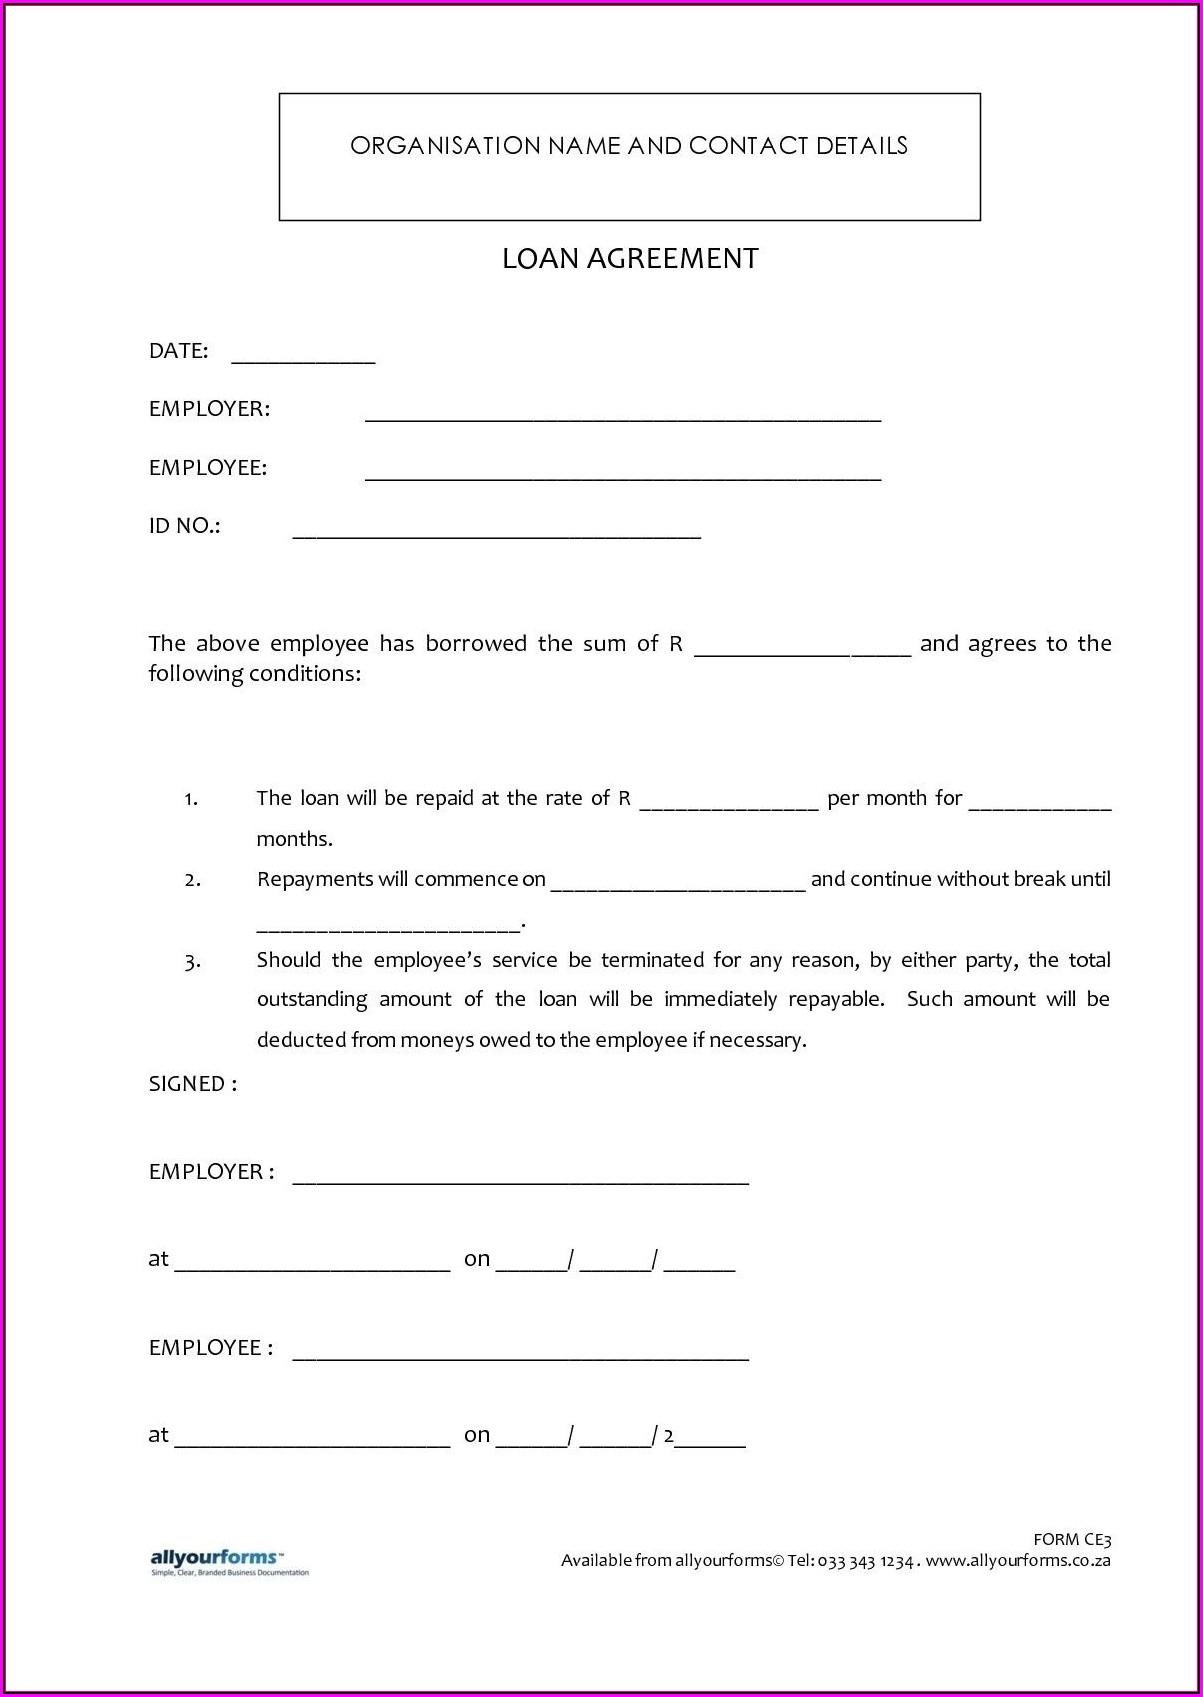 Loan Agreement Sample Format India